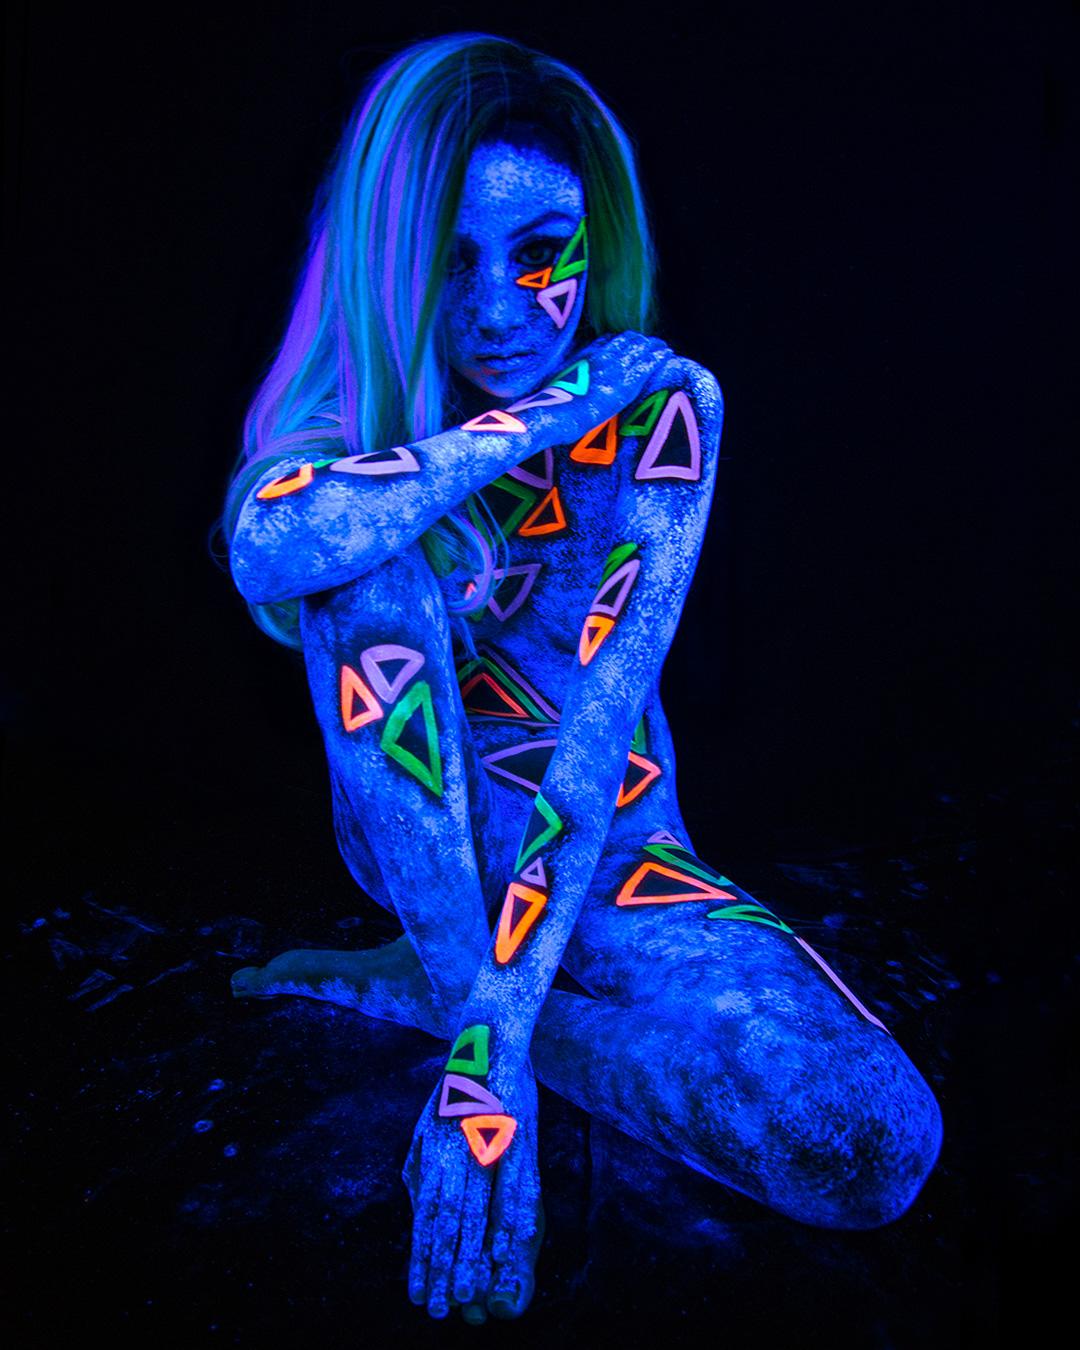 tetrahedrons